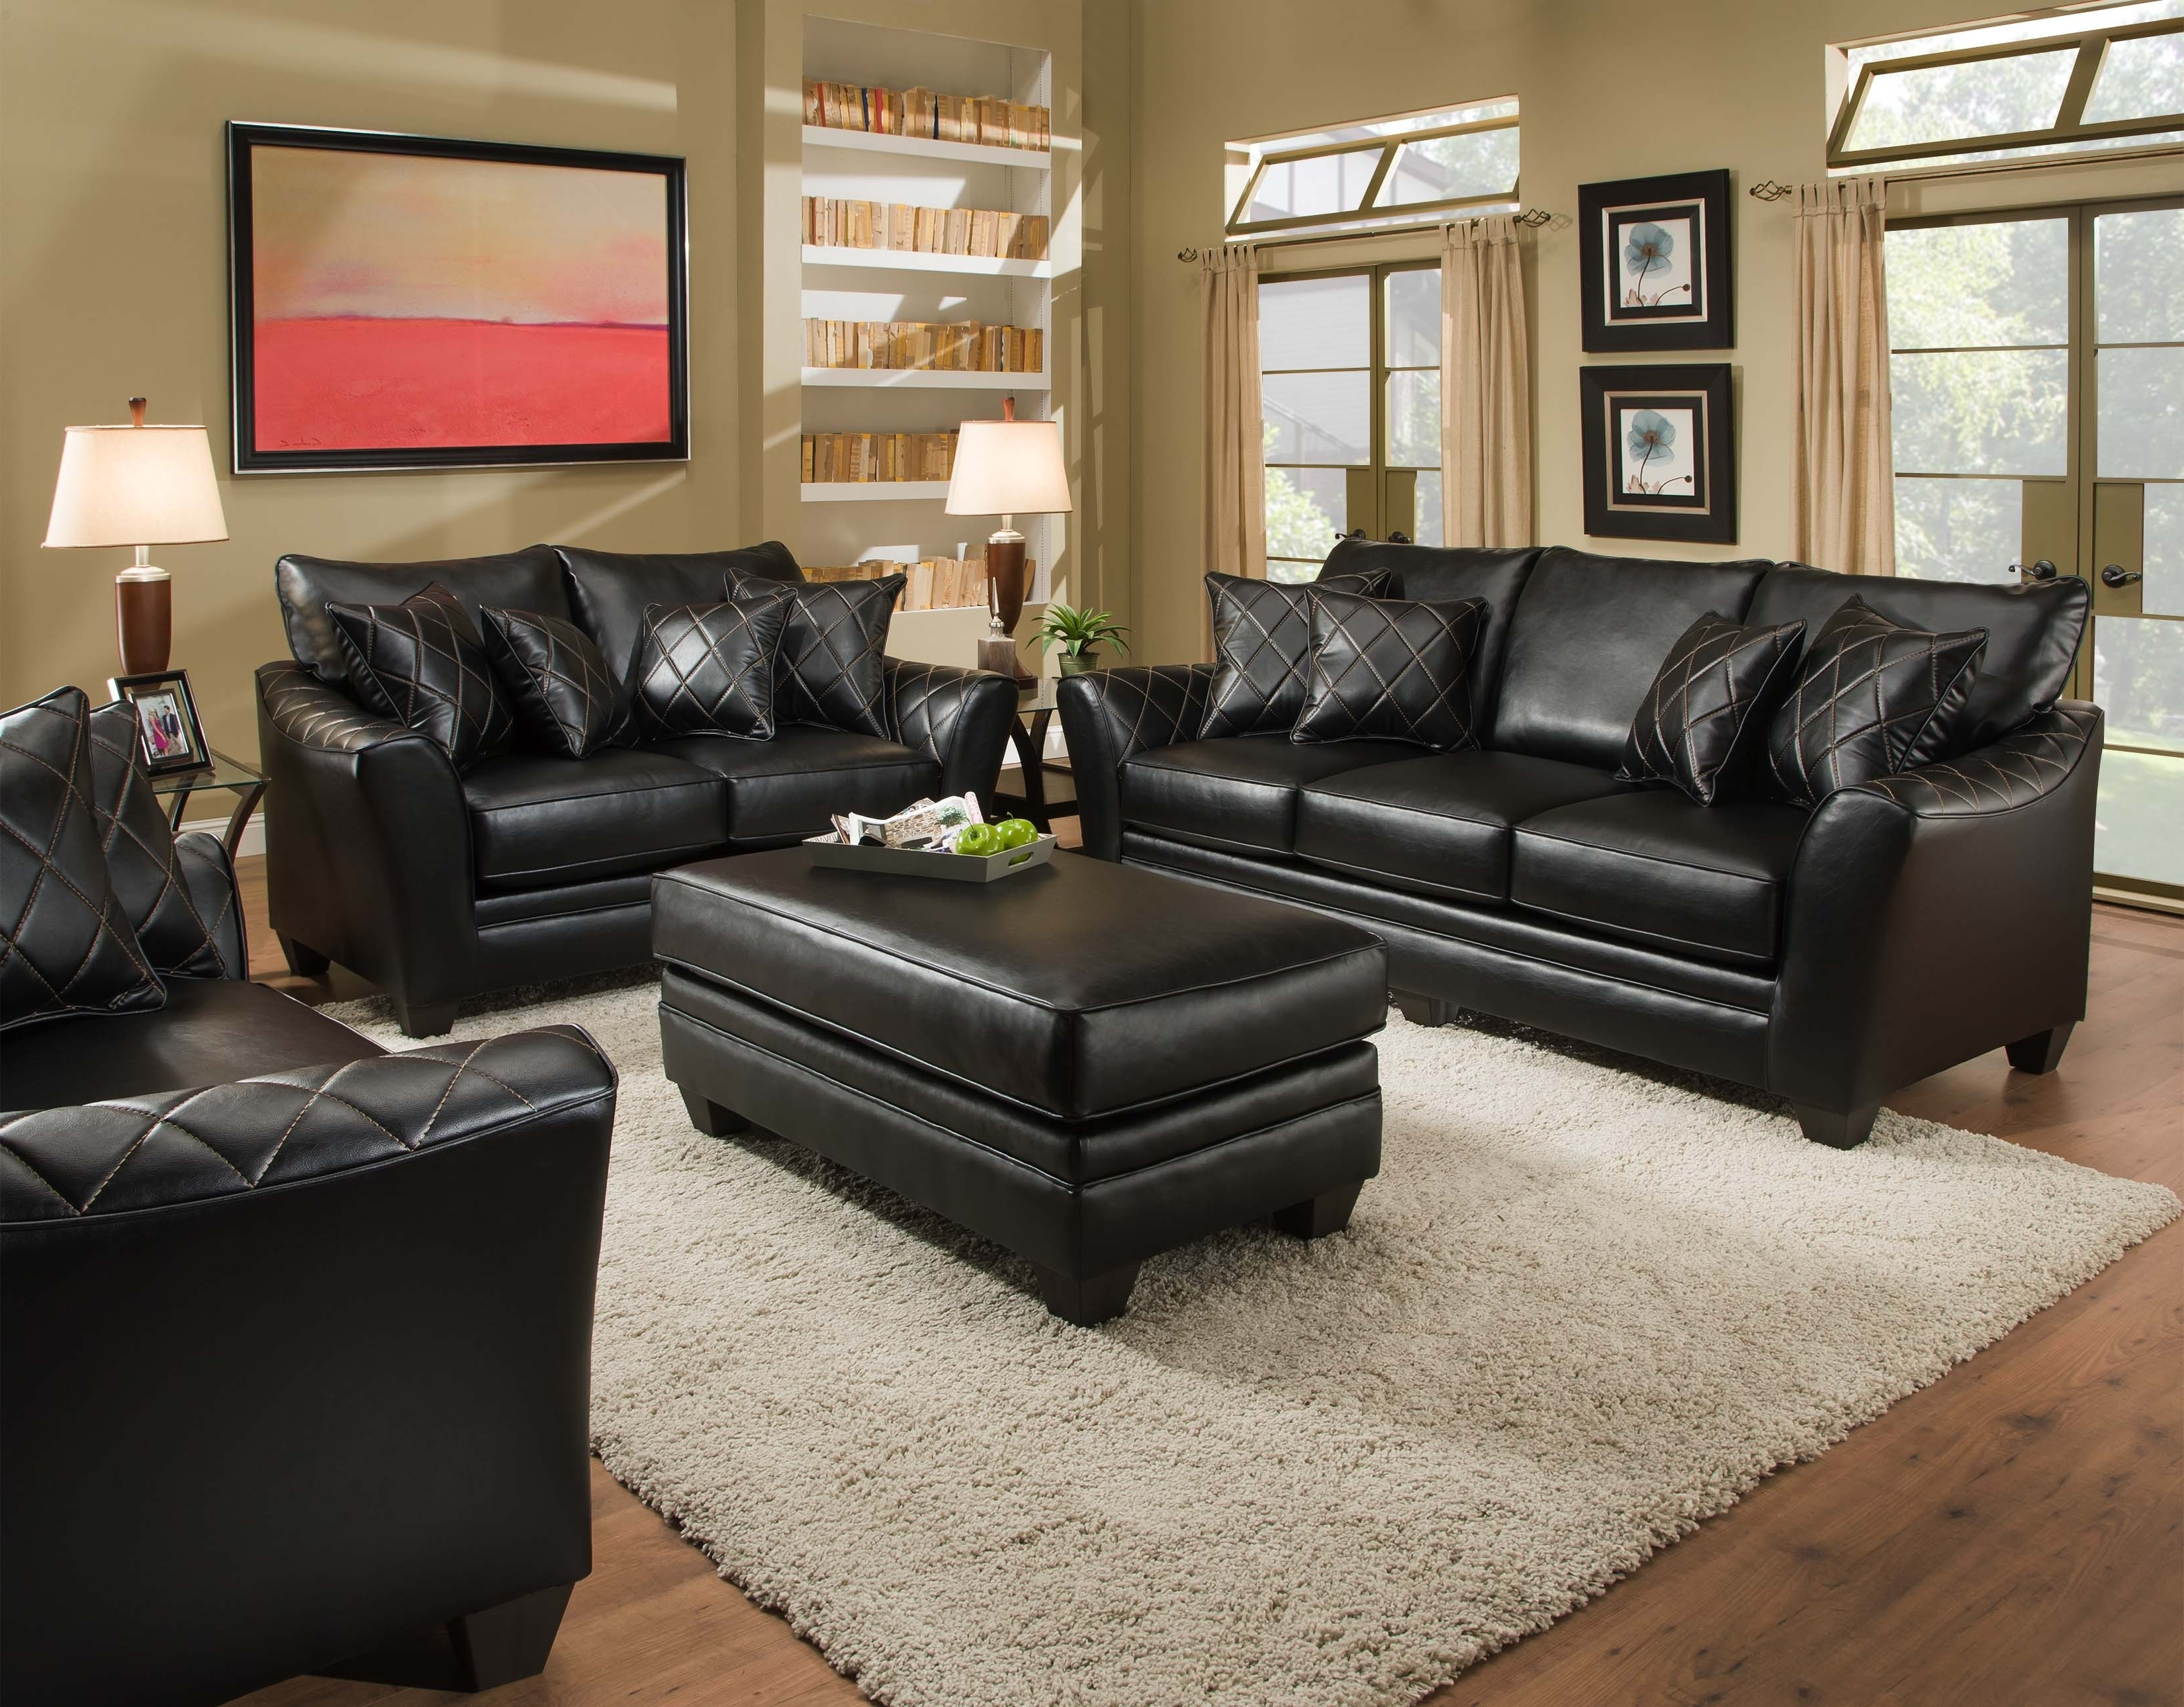 Luxury Sectional Sofa Nebraska Furniture Mart U2013 Buildsimplehome Within  Newest Nebraska Furniture Mart Sectional Sofas (